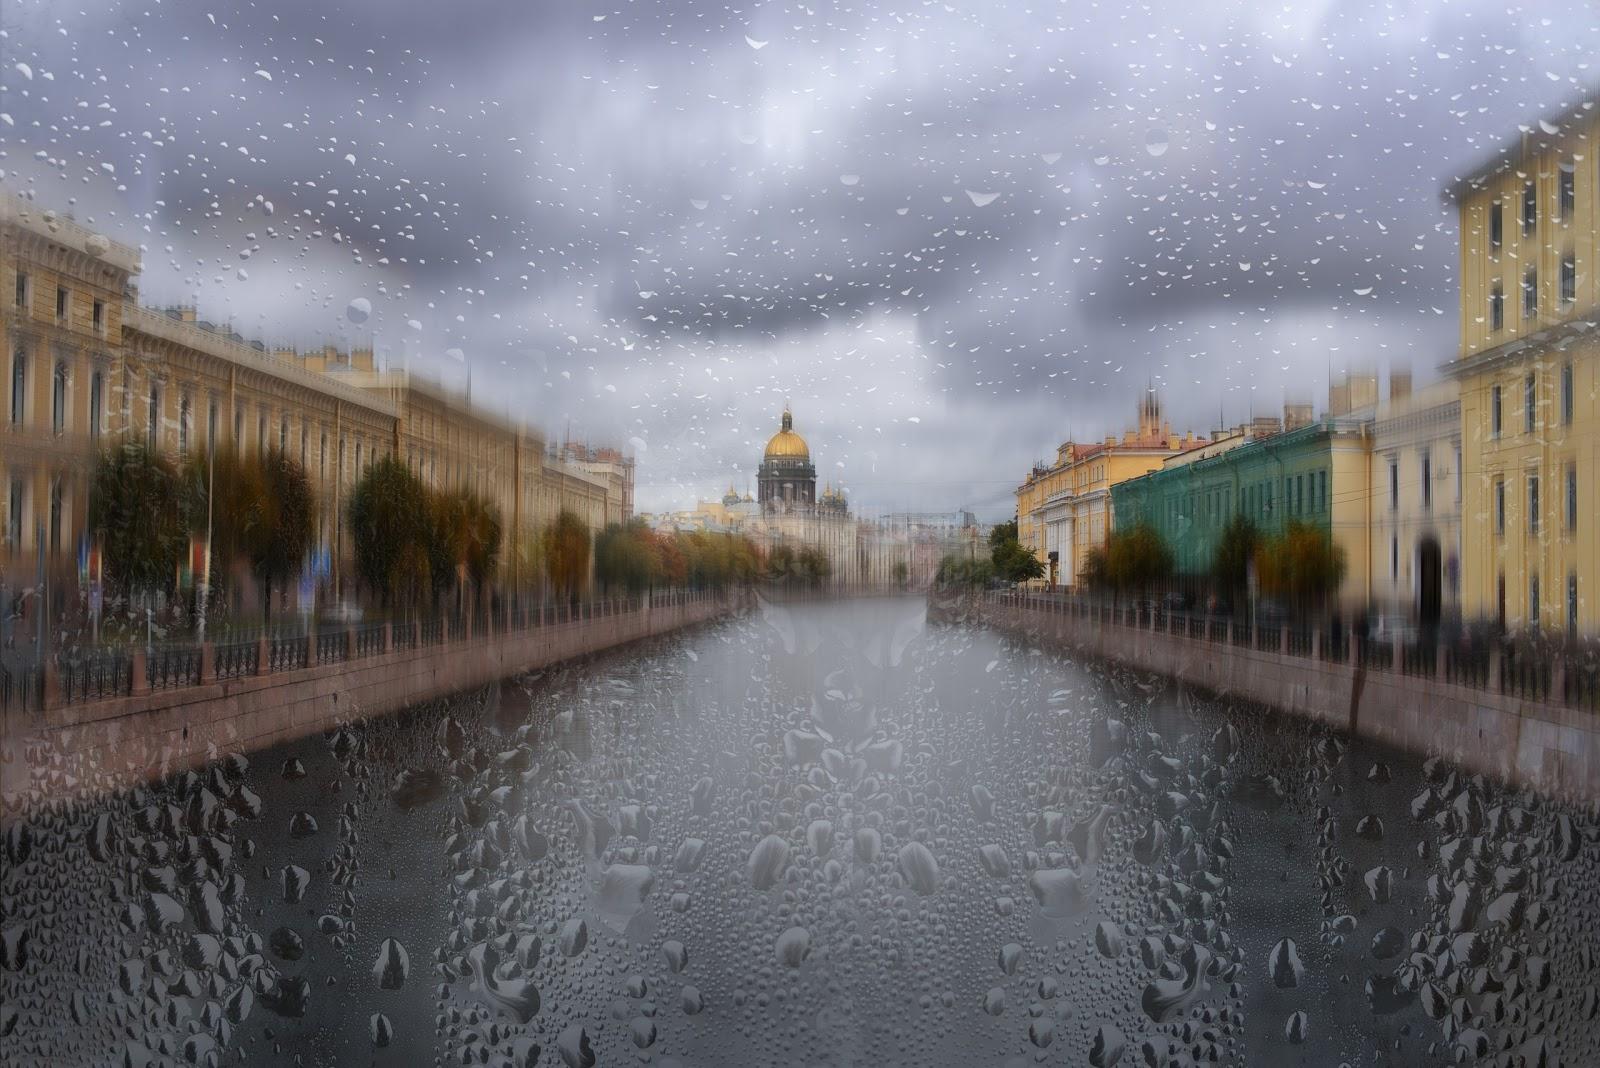 Санкт-Петербург. Дождь